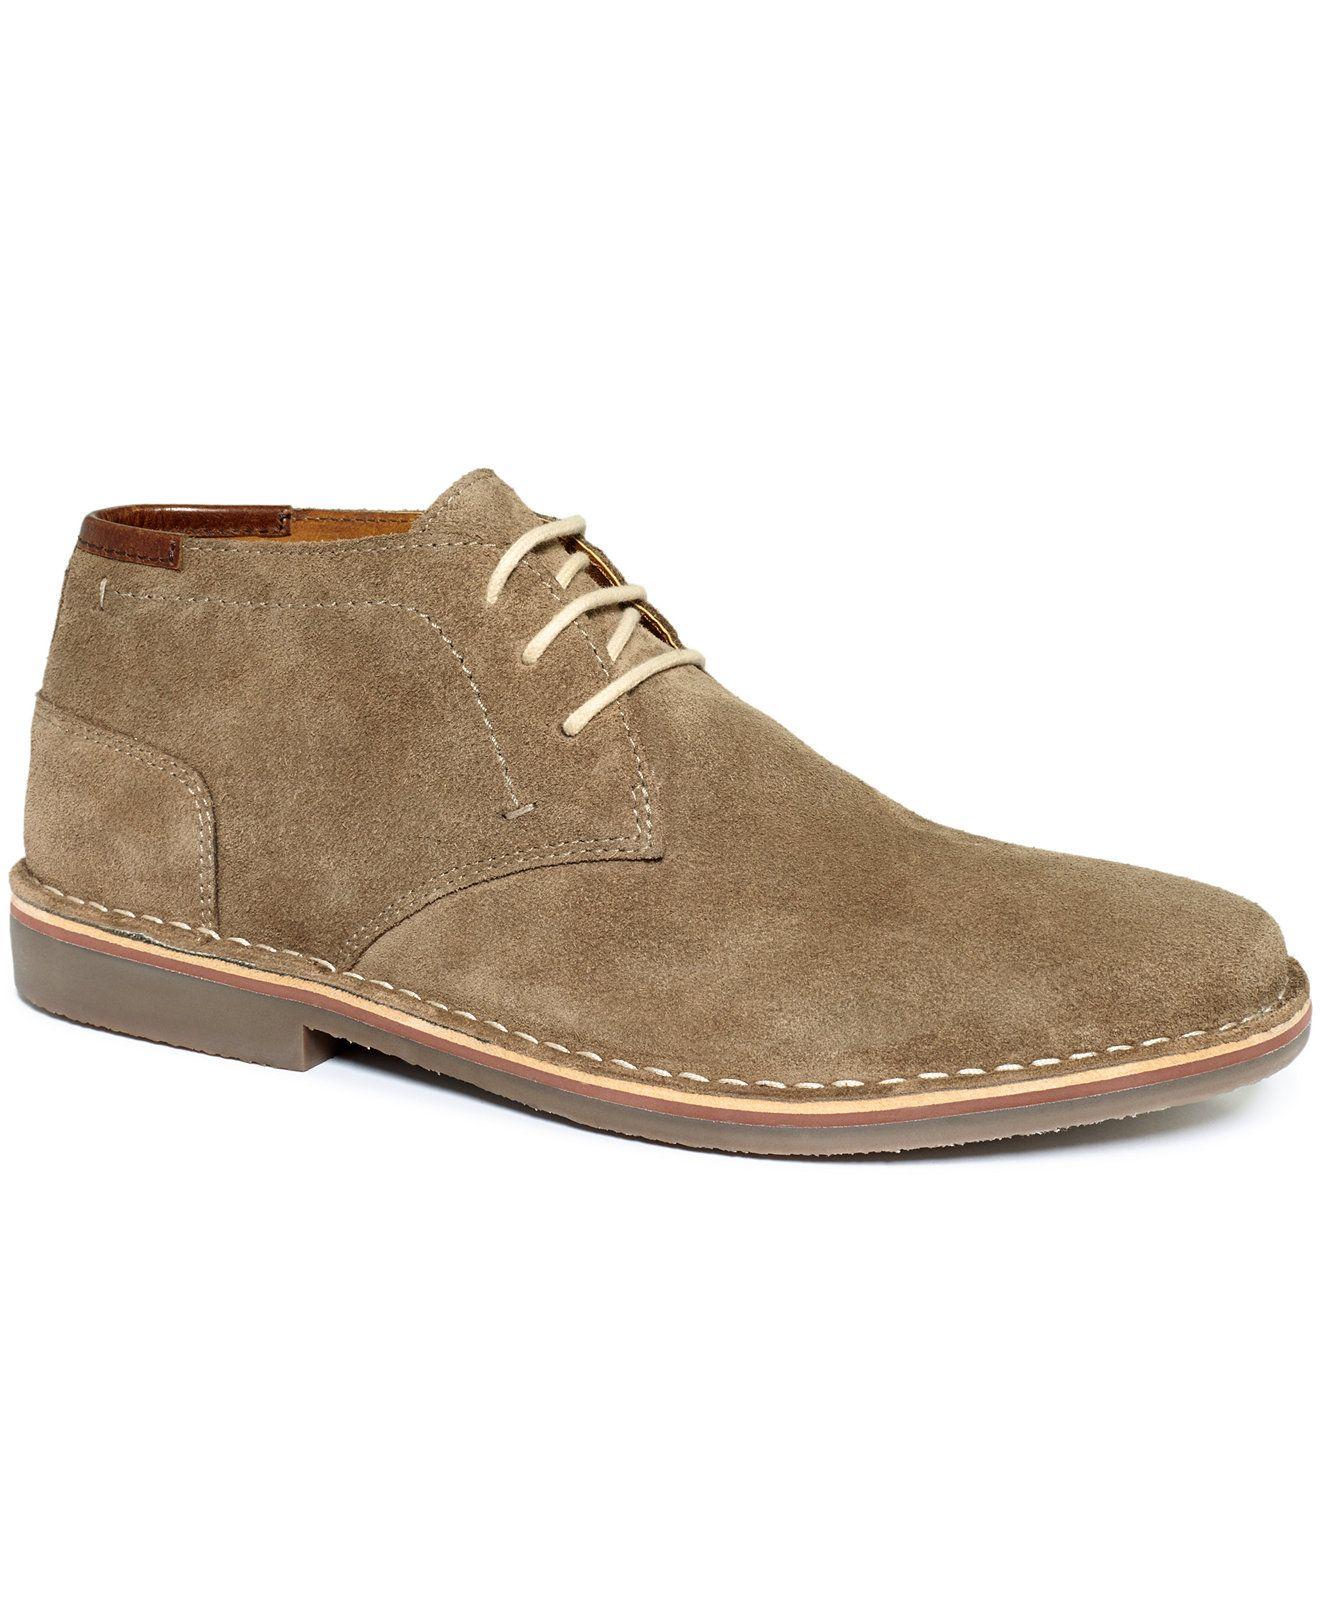 Kenneth Cole Reaction Desert Sun Suede Chukkas - All Men's Shoes - Men -  Macy's. Mens Suede Chukka BootsLace UpShoes ...